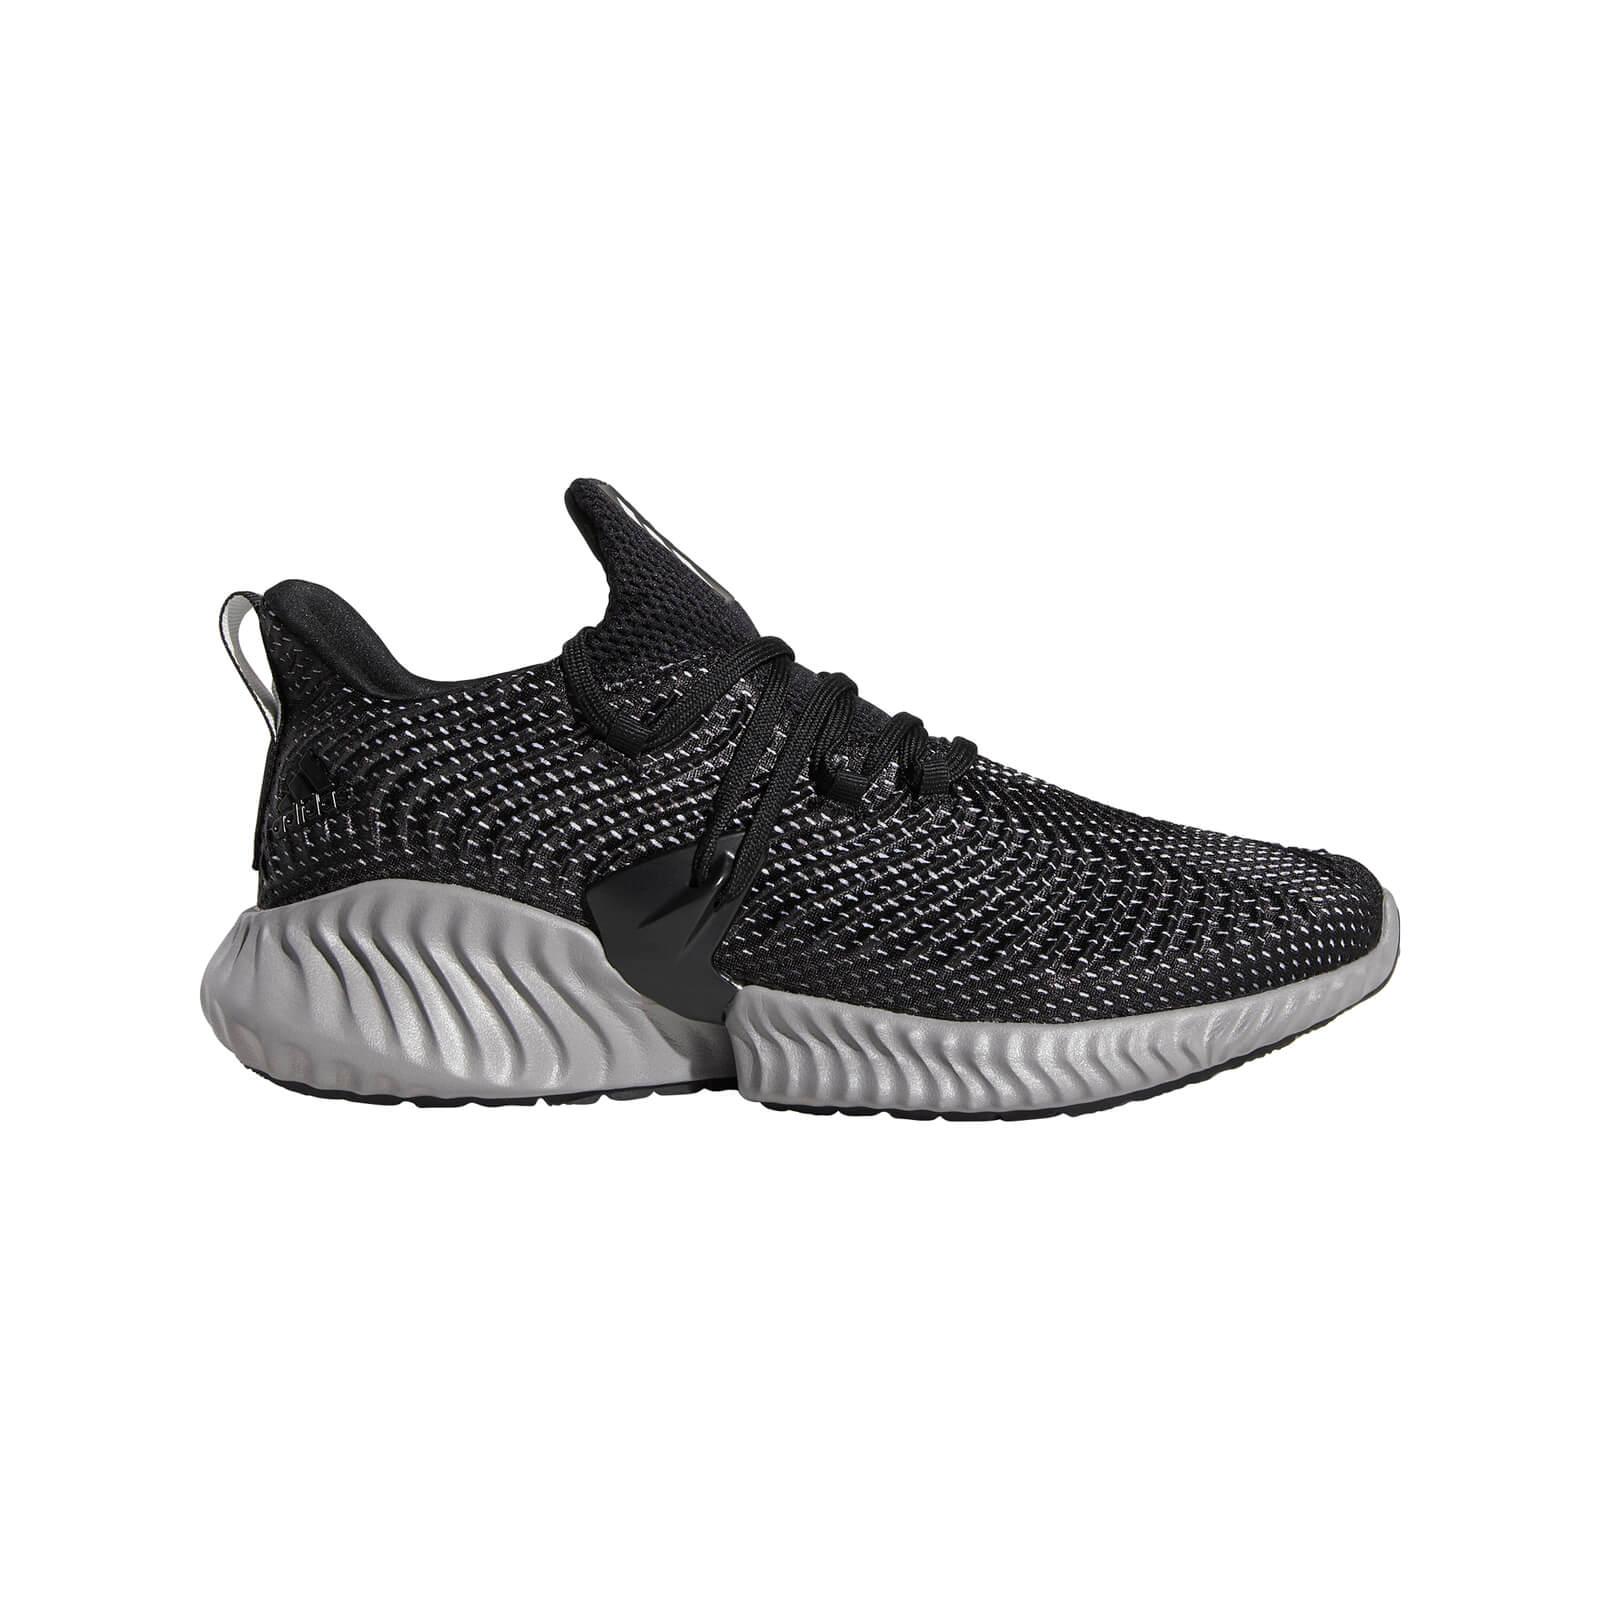 adidas Men's Alphabounce Instinct Running Shoes - Black - US 10.5/UK 10 - Black